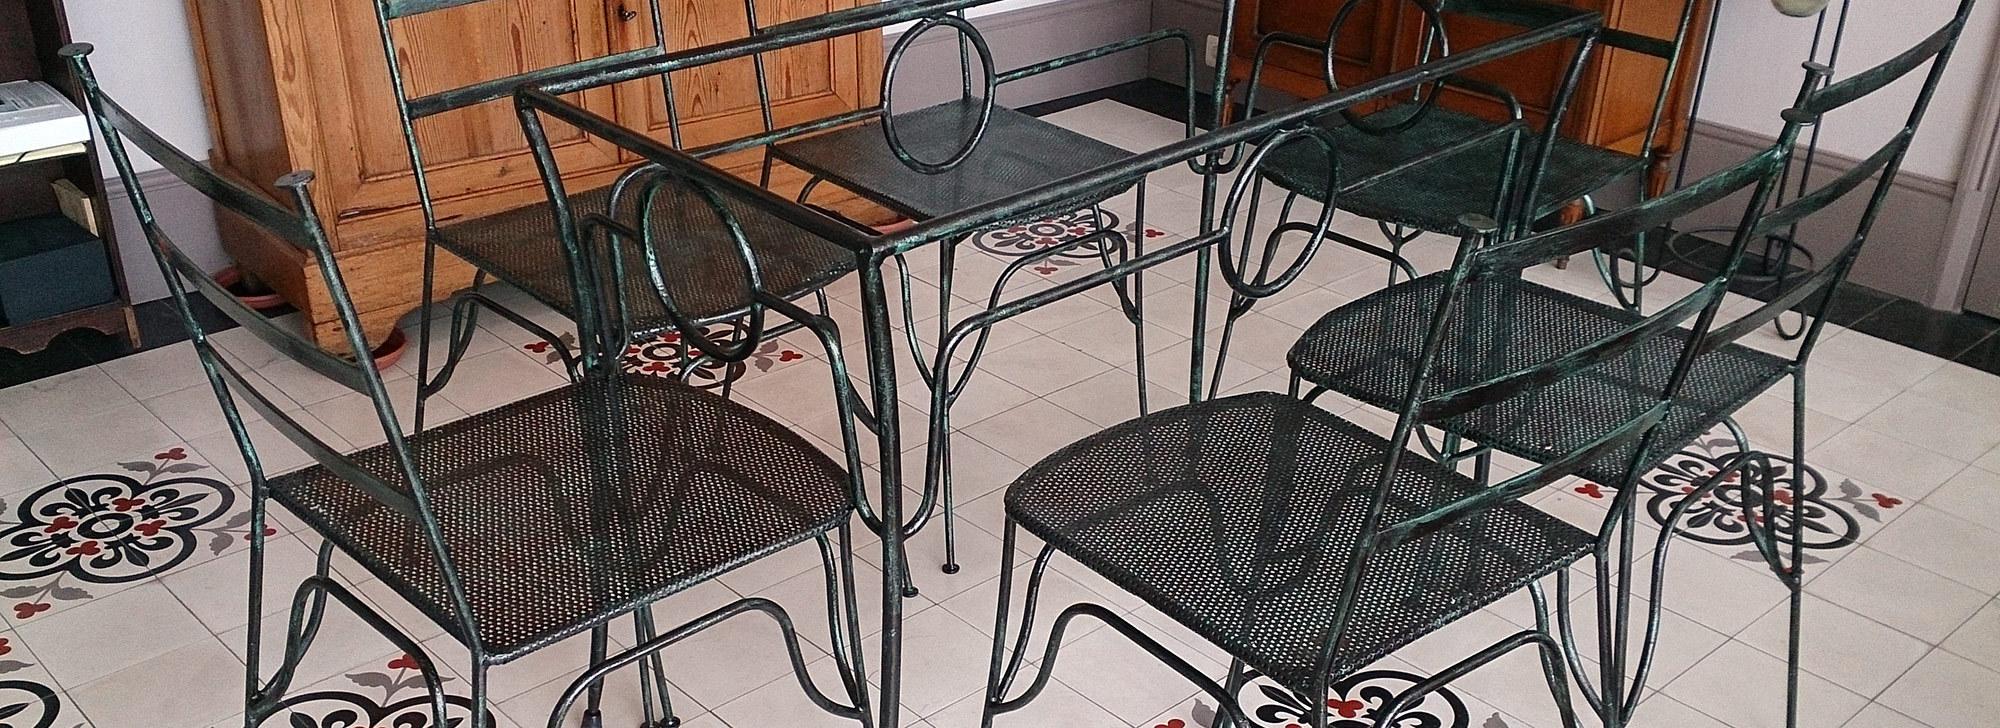 metallerie-chaises-table-acier-merignac